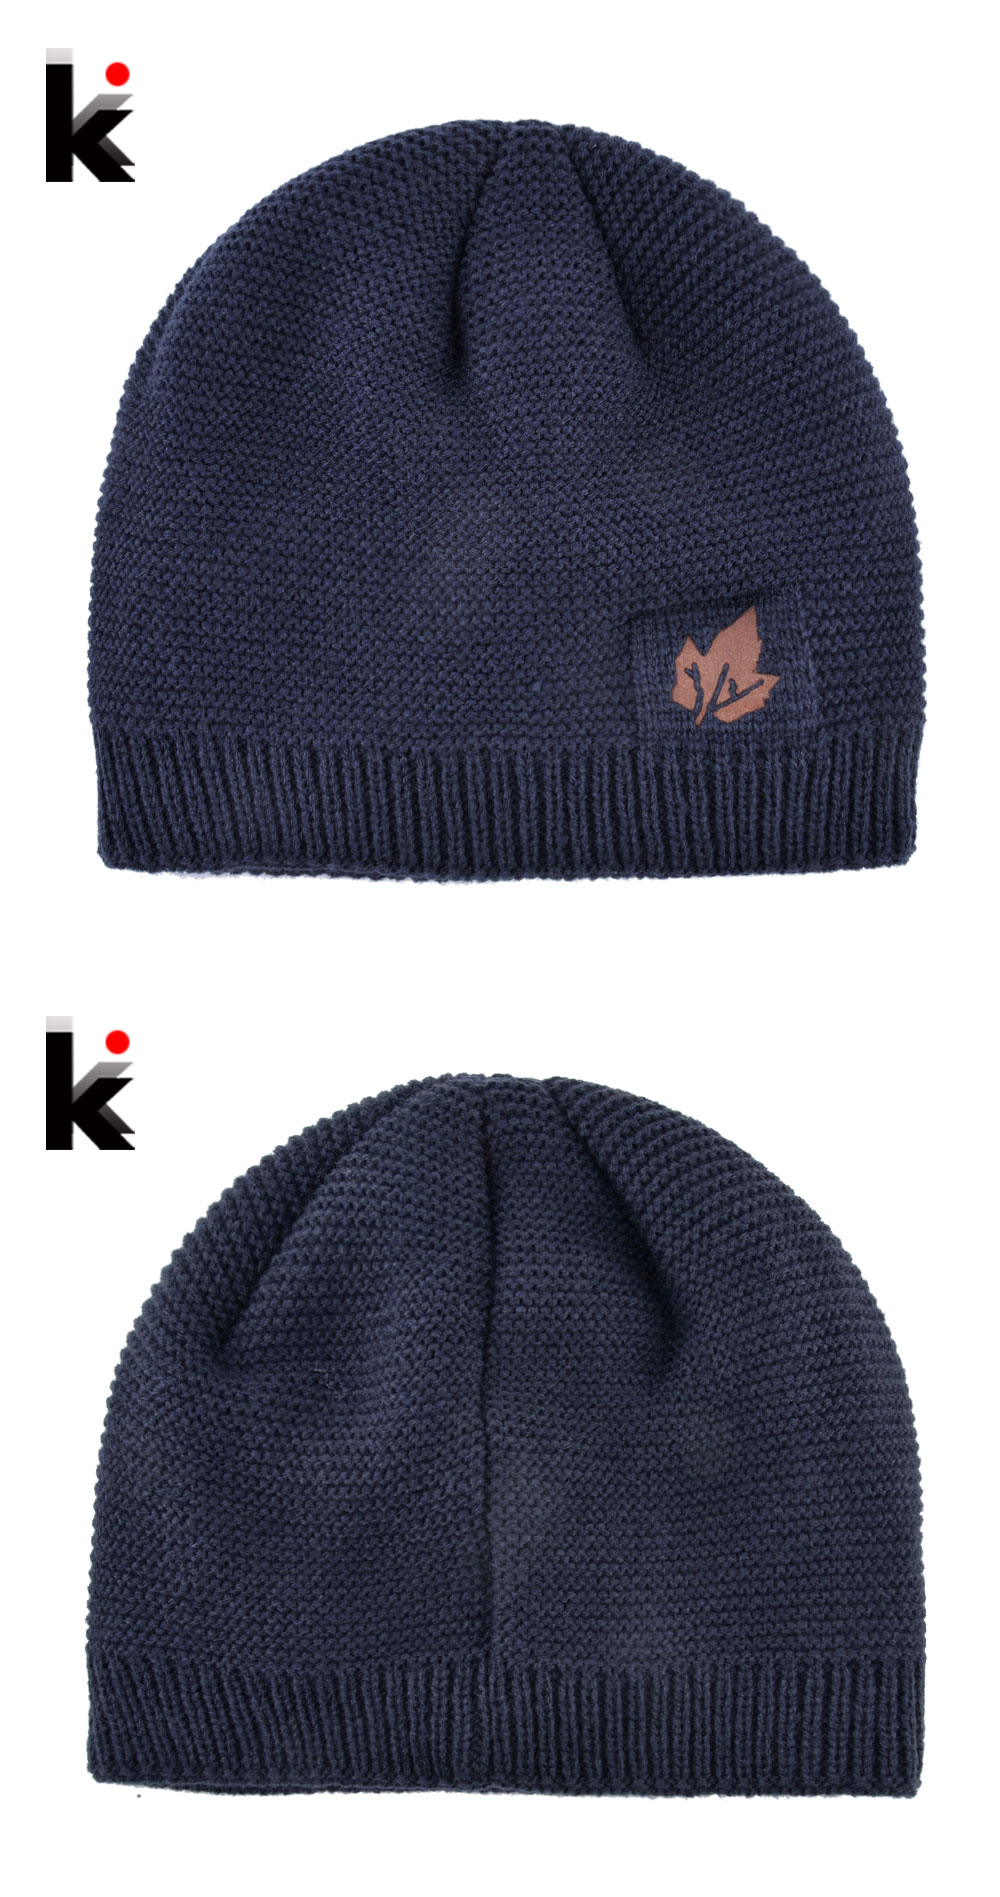 96d931e732a 2018 Men Winter Hat Scarf Sets Fashion Maple Leaf Knitted Skullies Beanies  Man Thick Add Velvet Knit Bonnet Cap Boys Scarves Set. K 01 K 02 ...